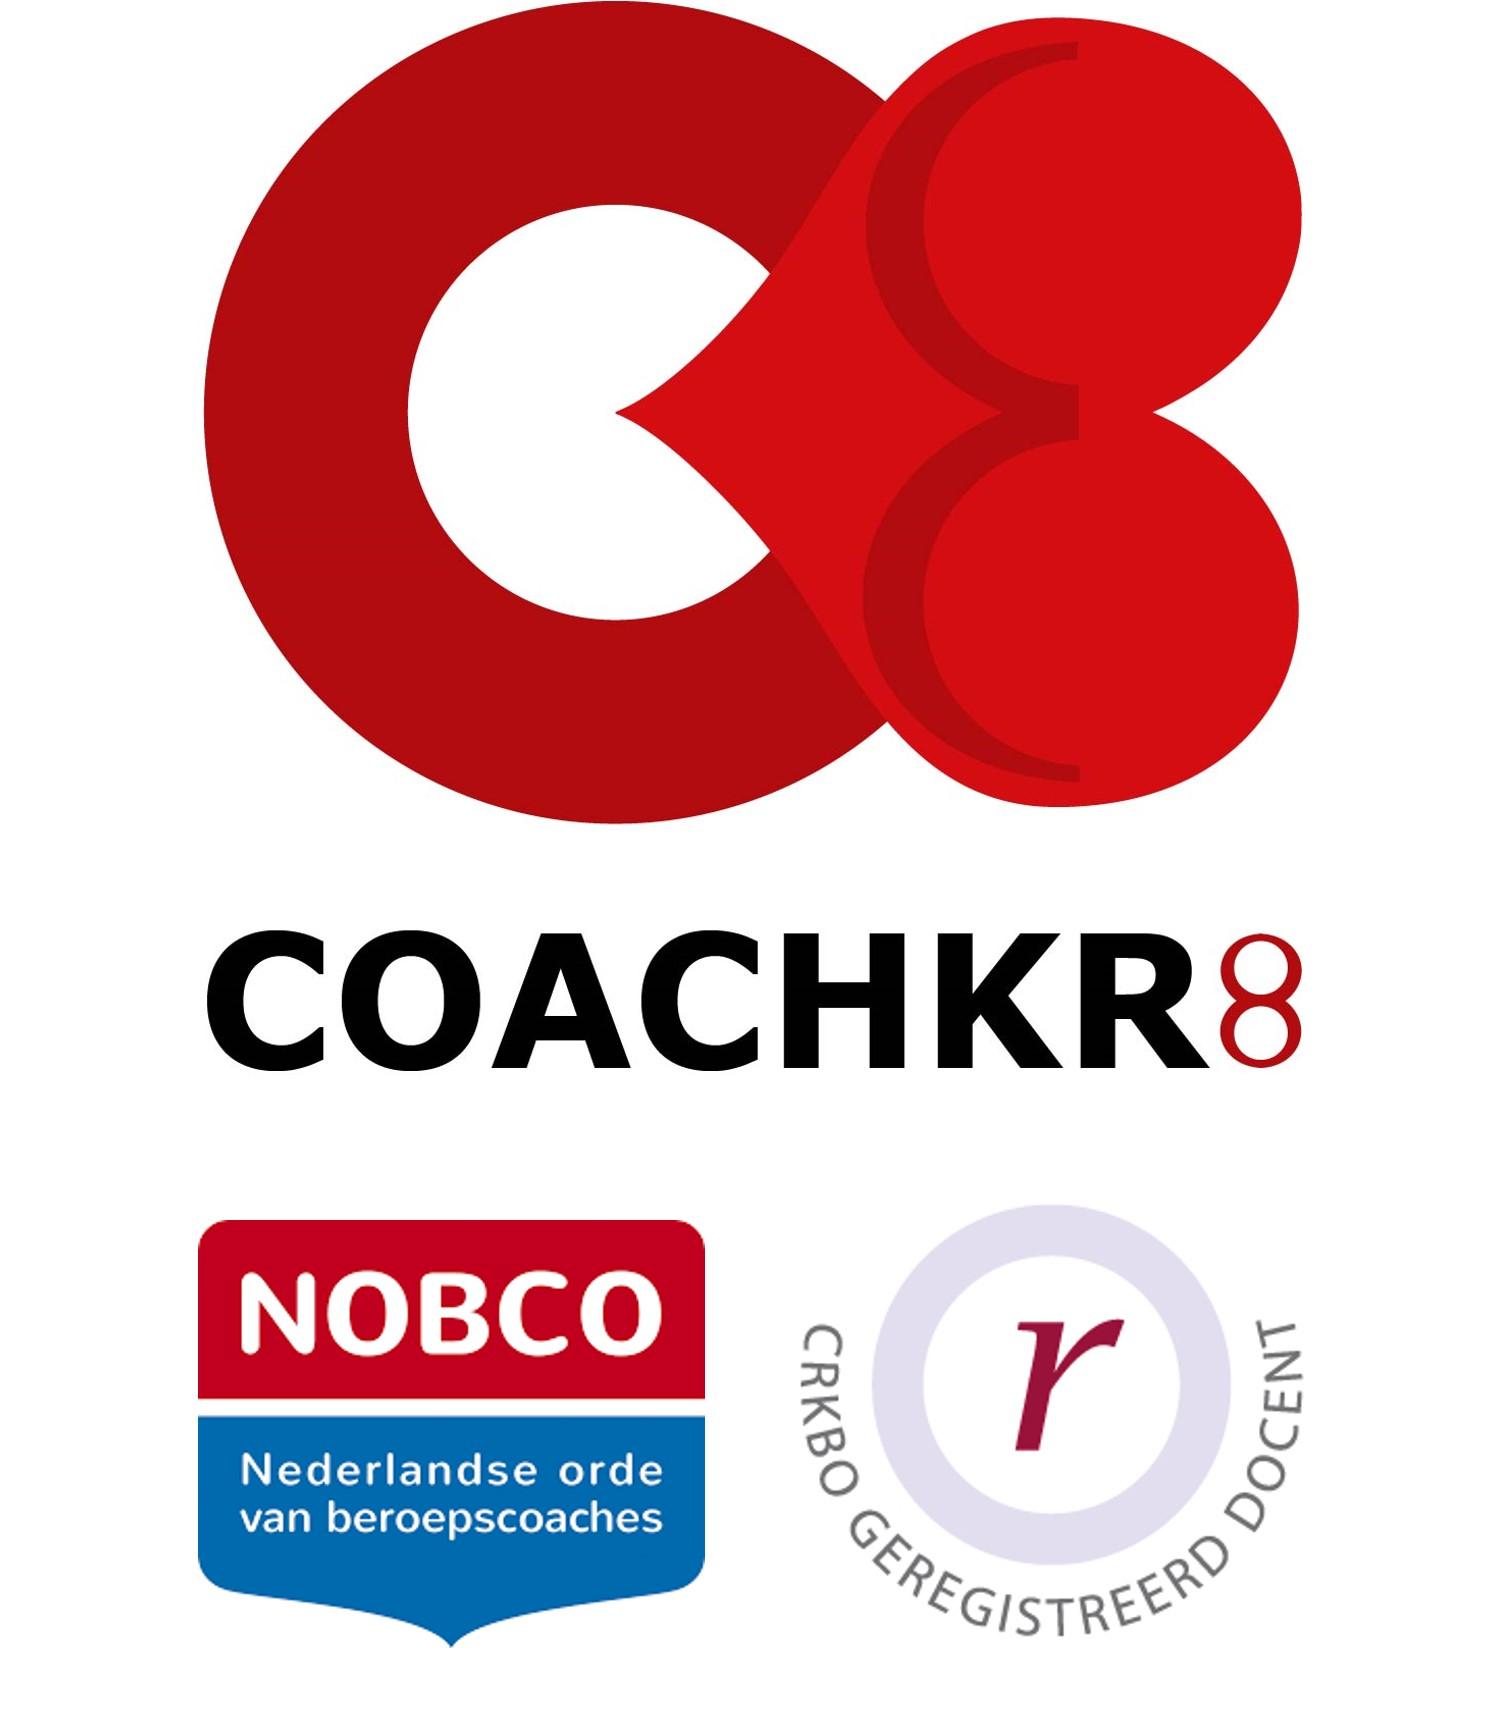 coachkr8